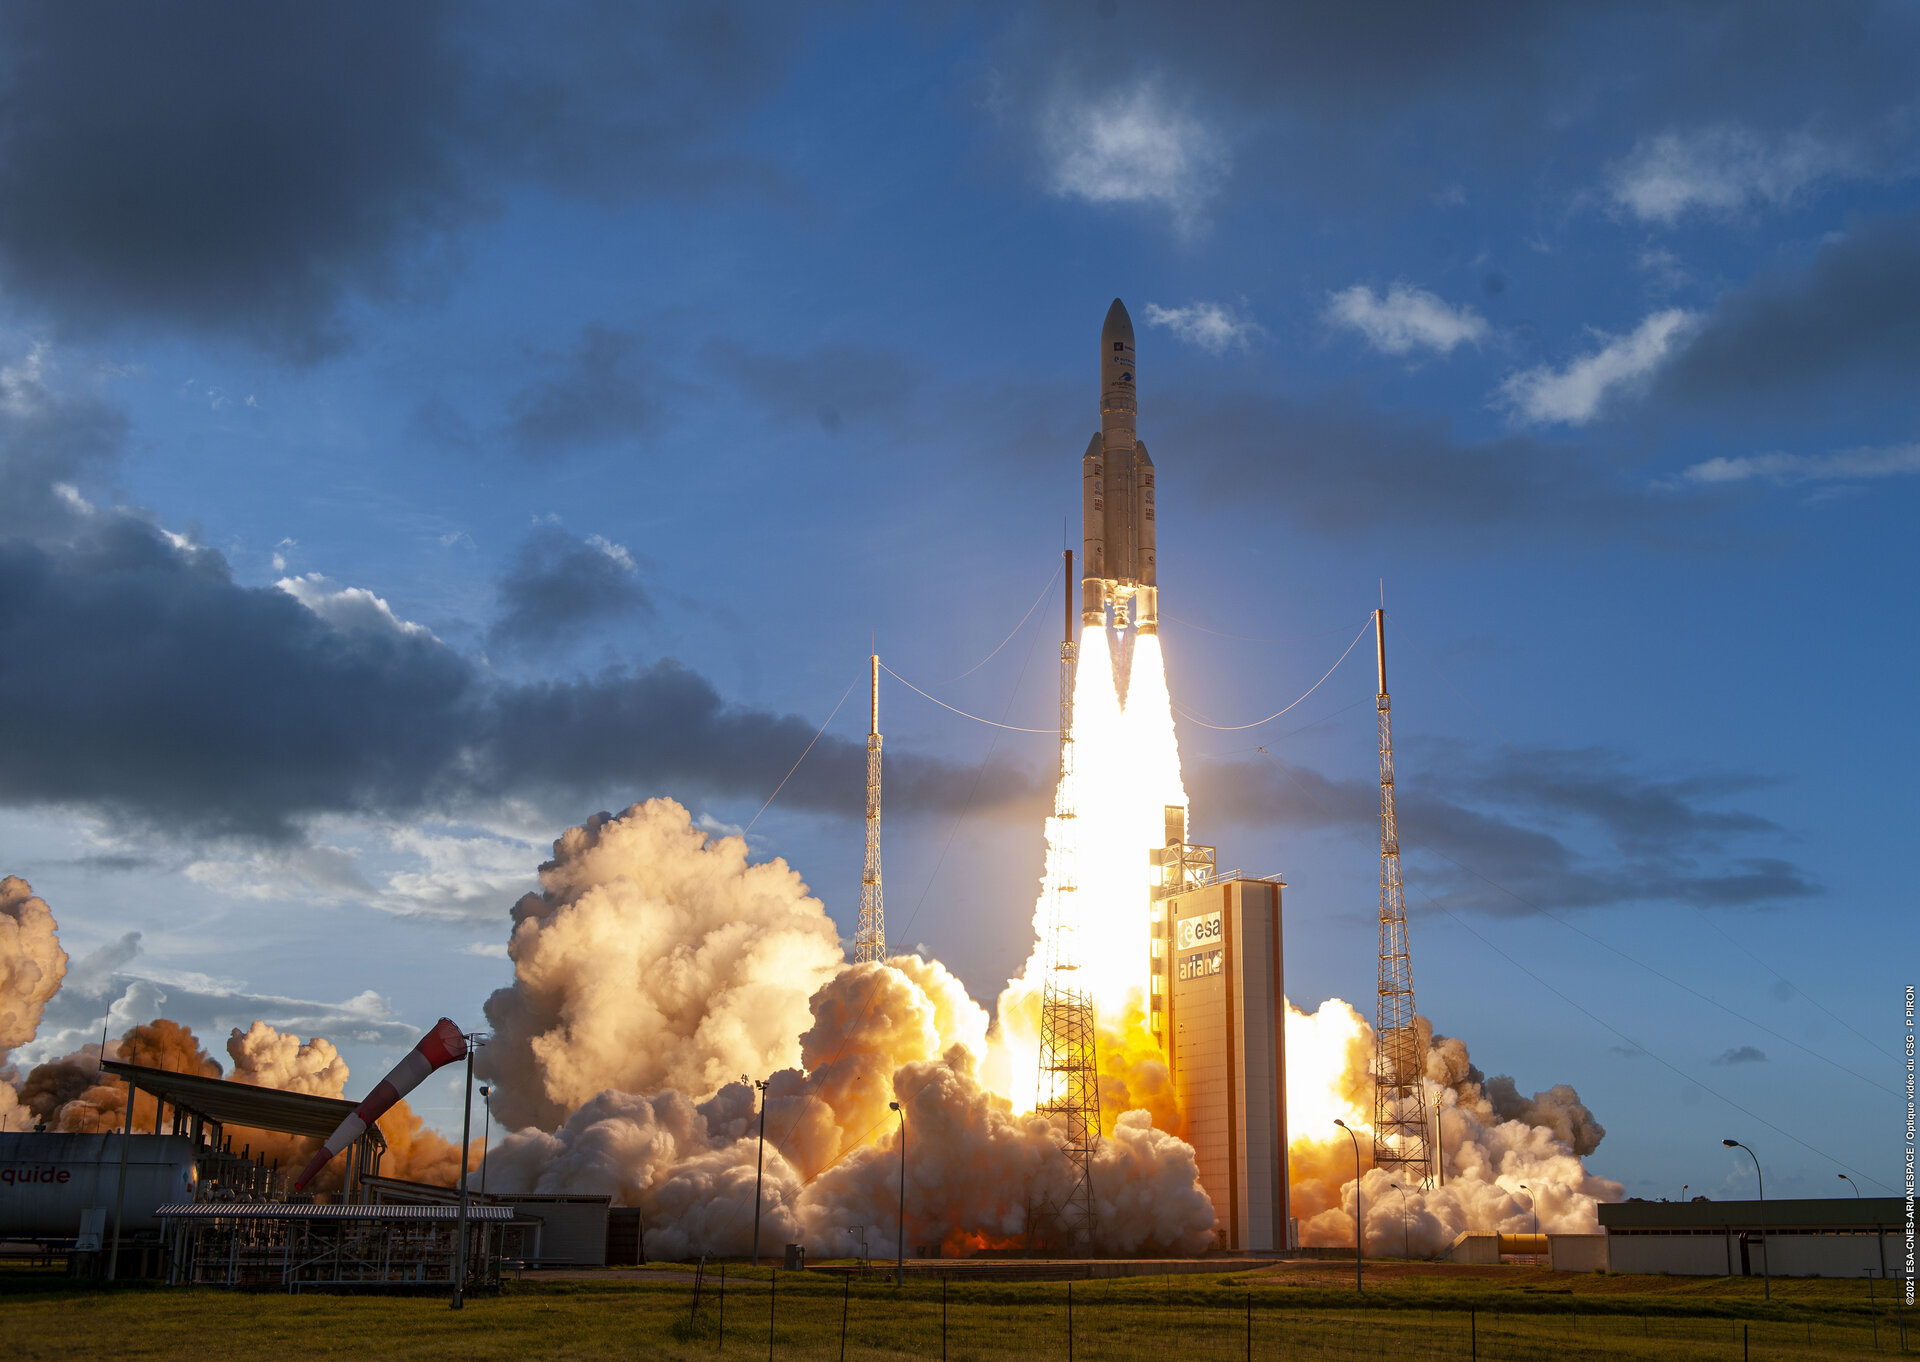 Space news - Ariane 5 launch